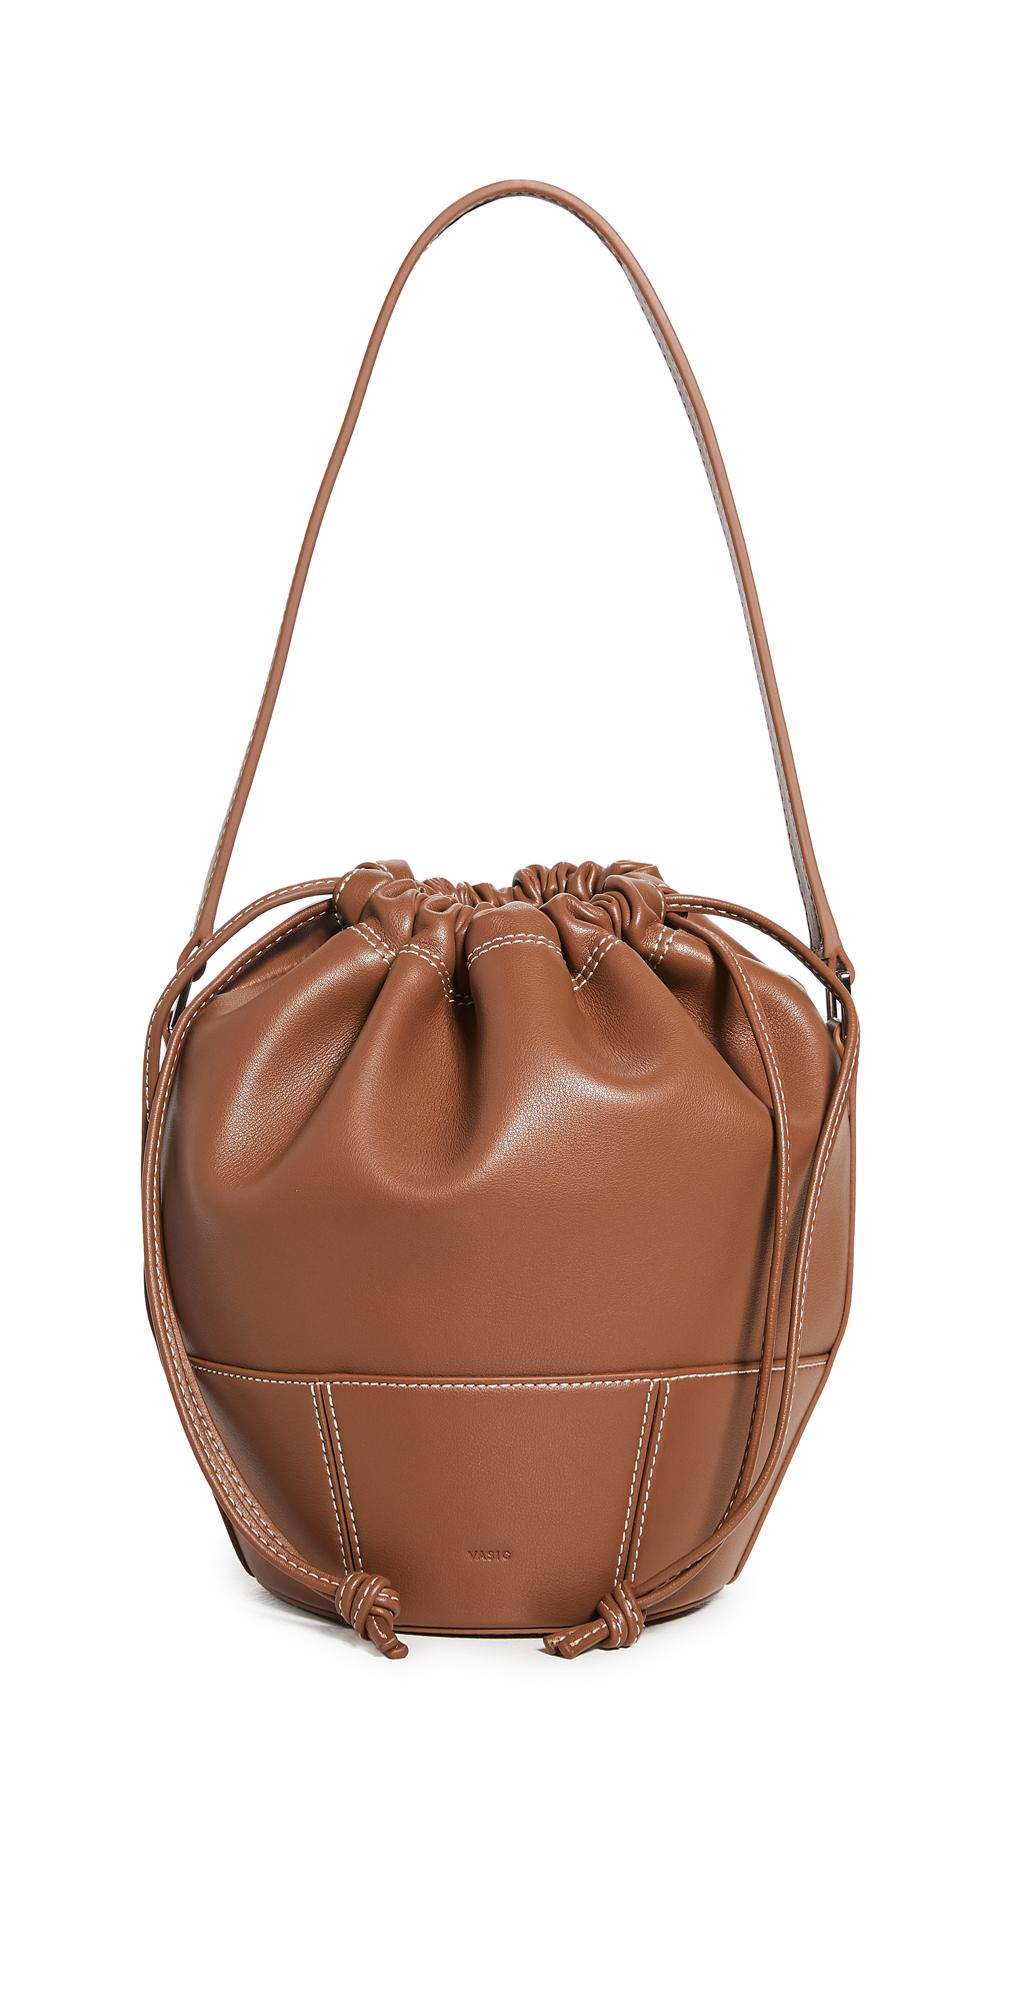 Vasic Gem Bucket Bag